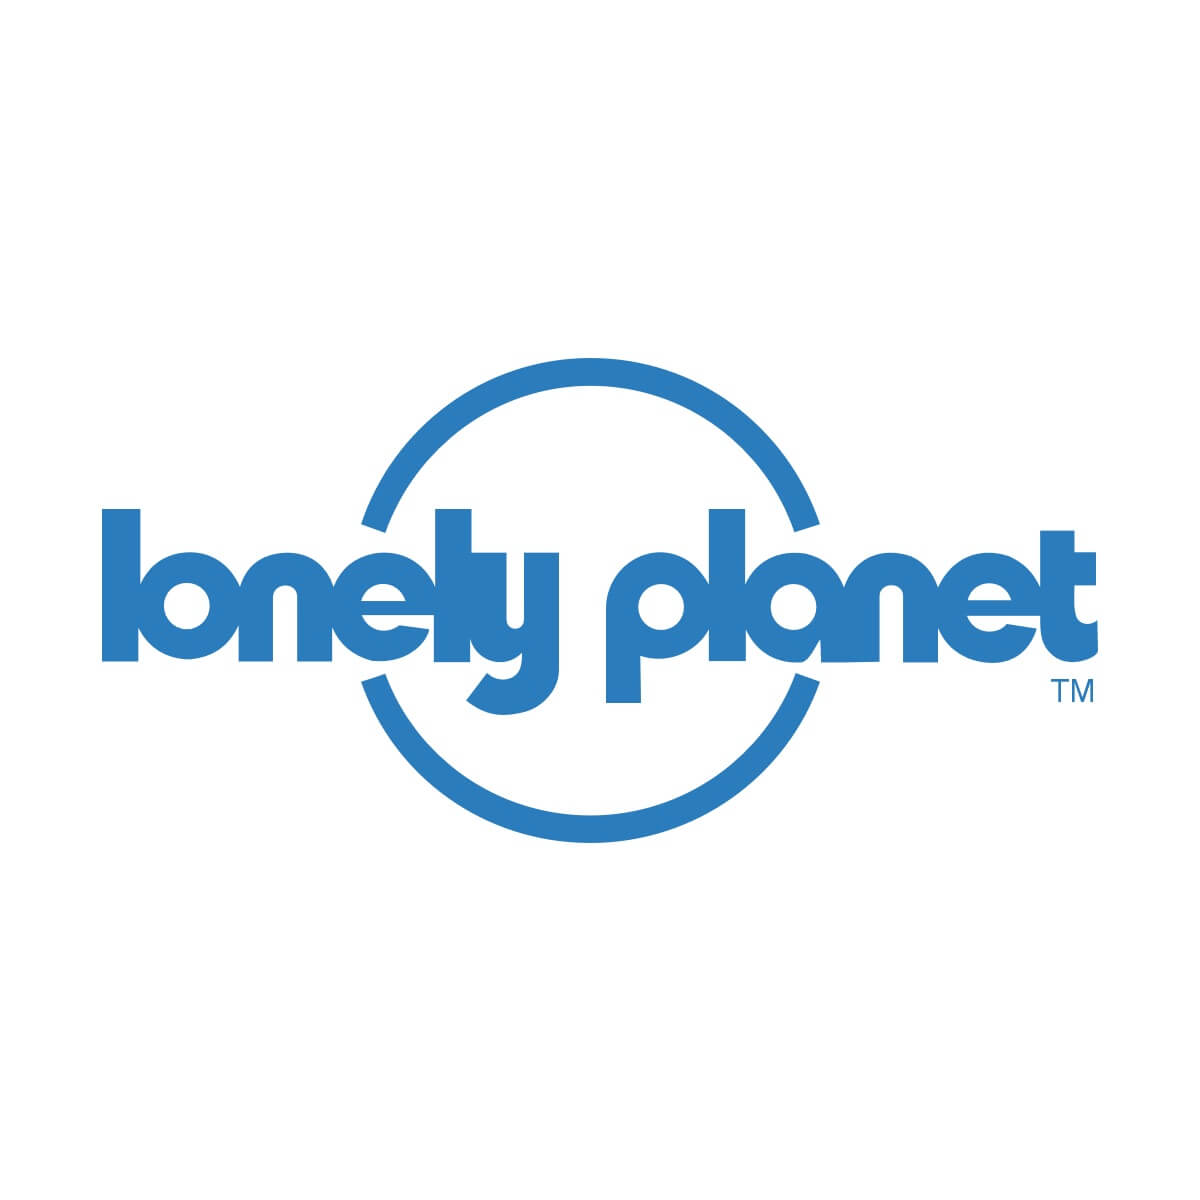 LonelyPlanet GLOBAL